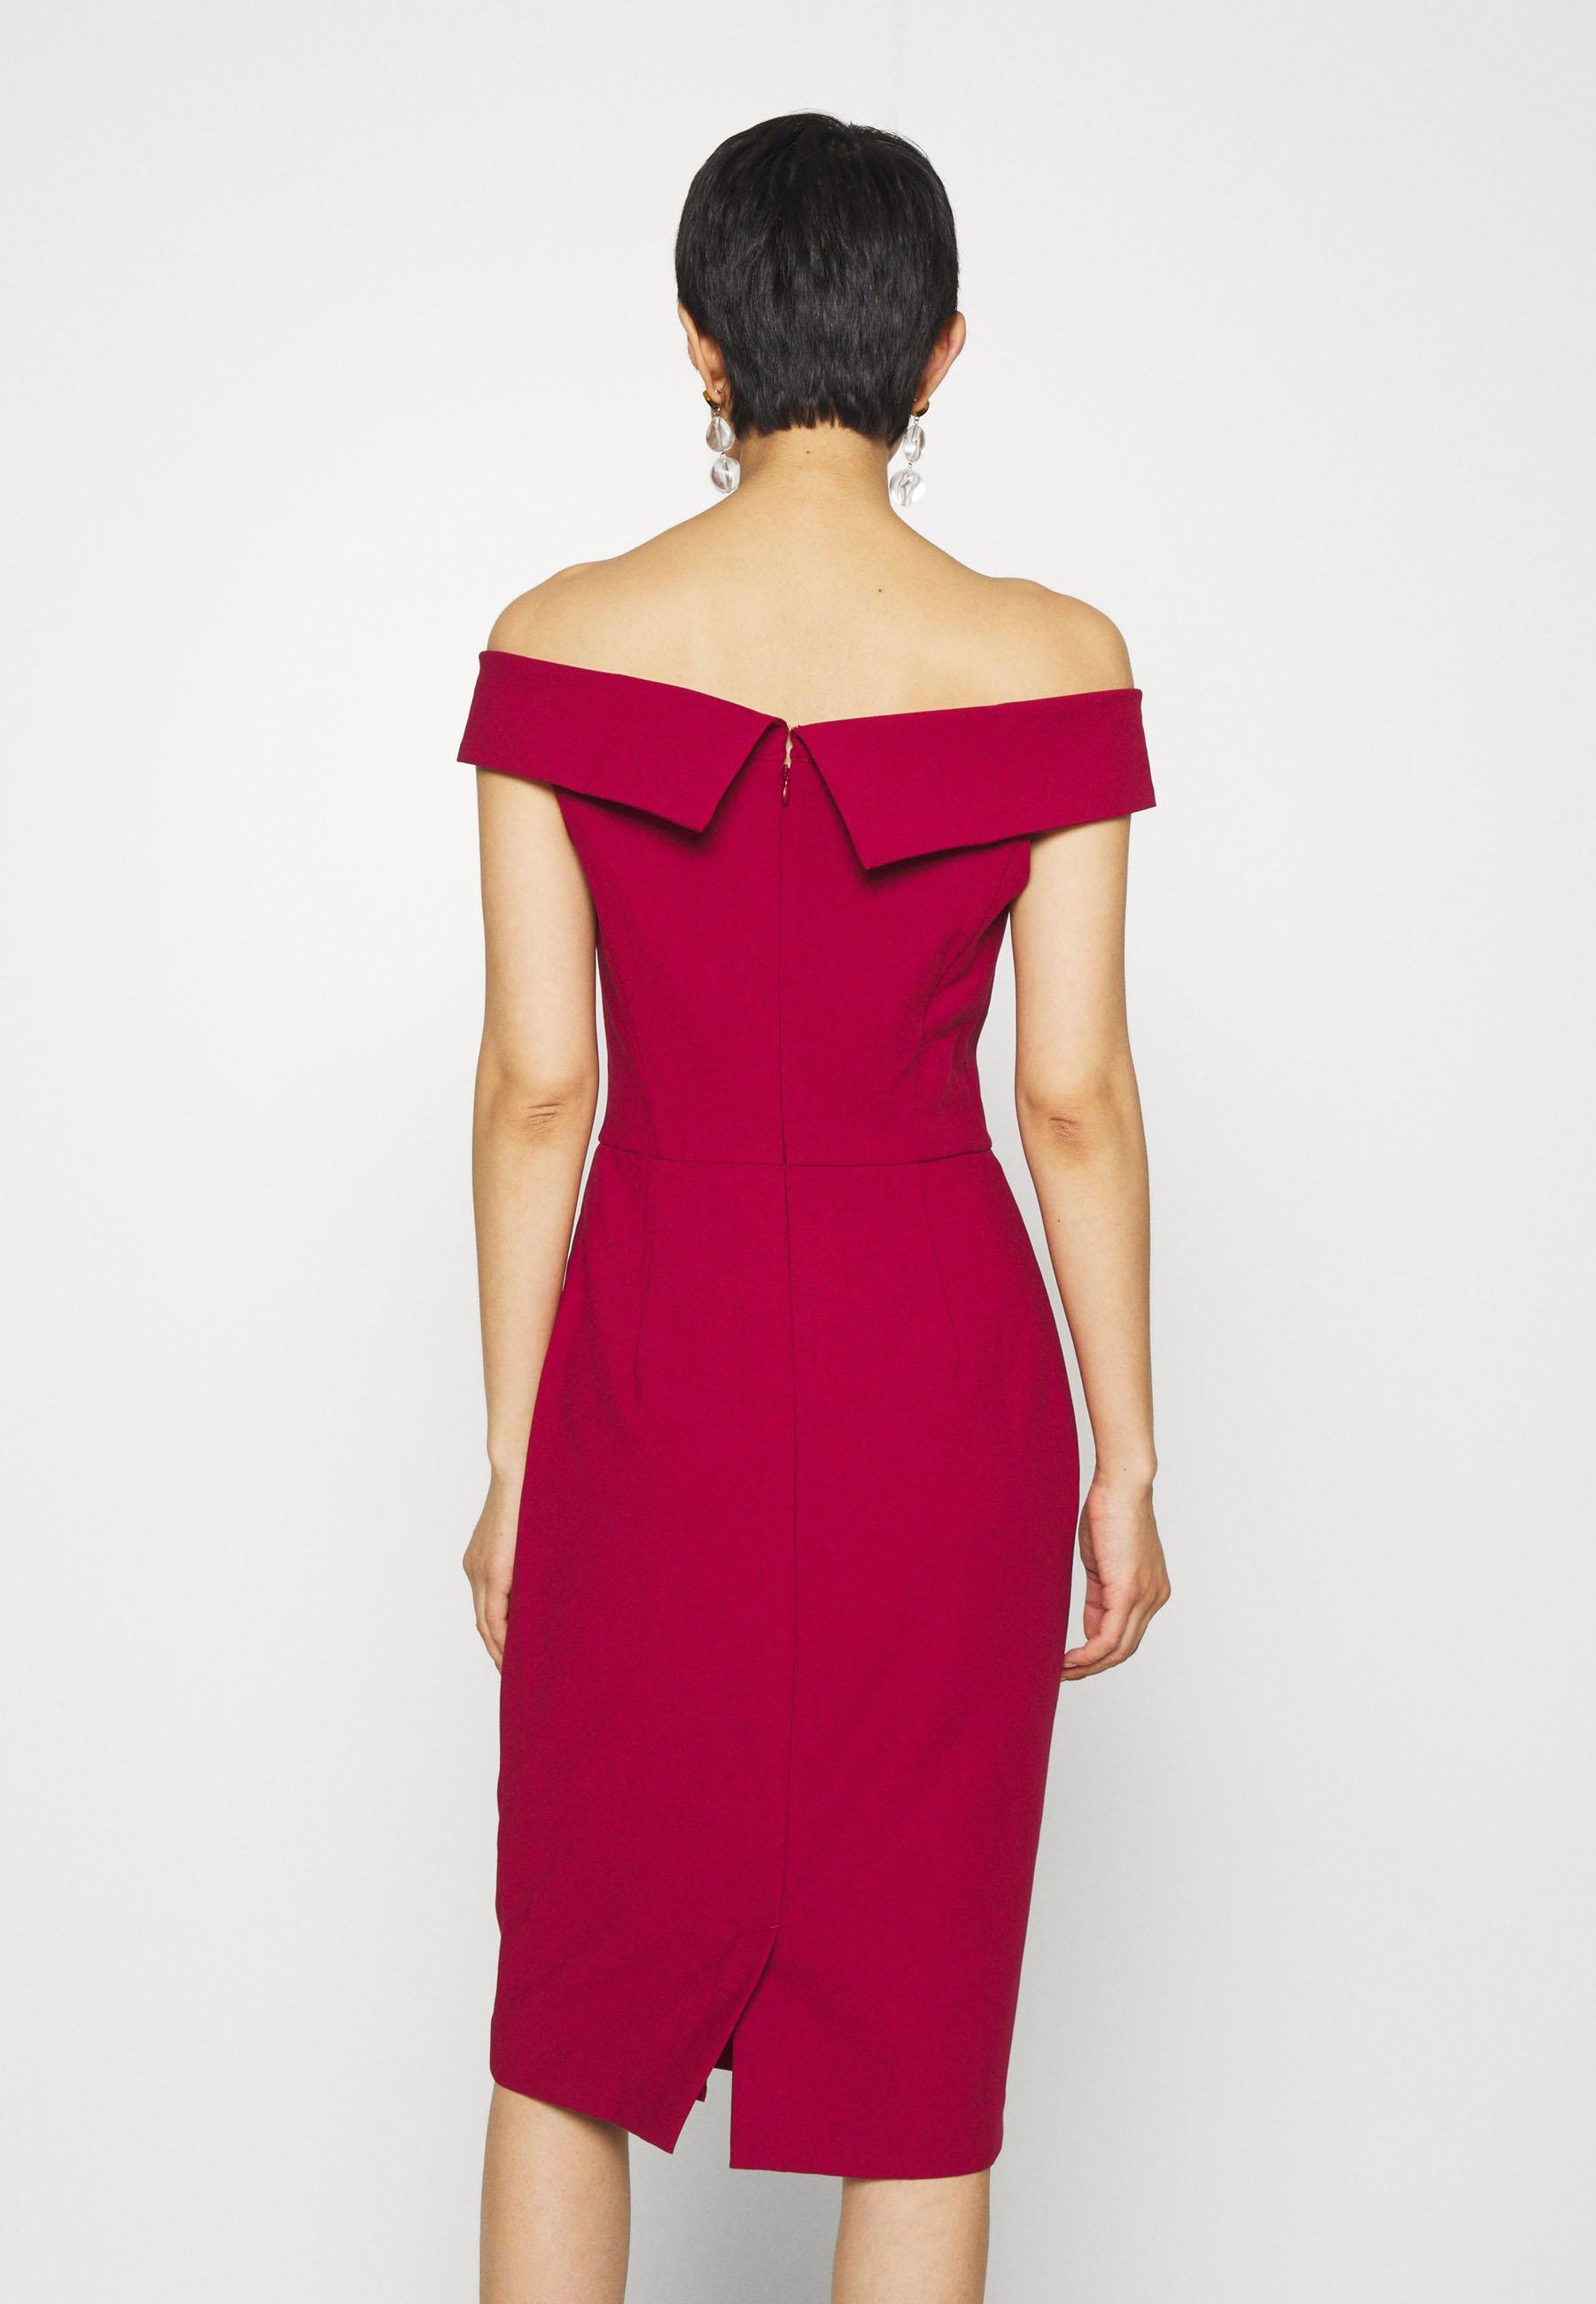 IVY & OAK CARMEN DRESS Etuikleid cassis sorbet/pink